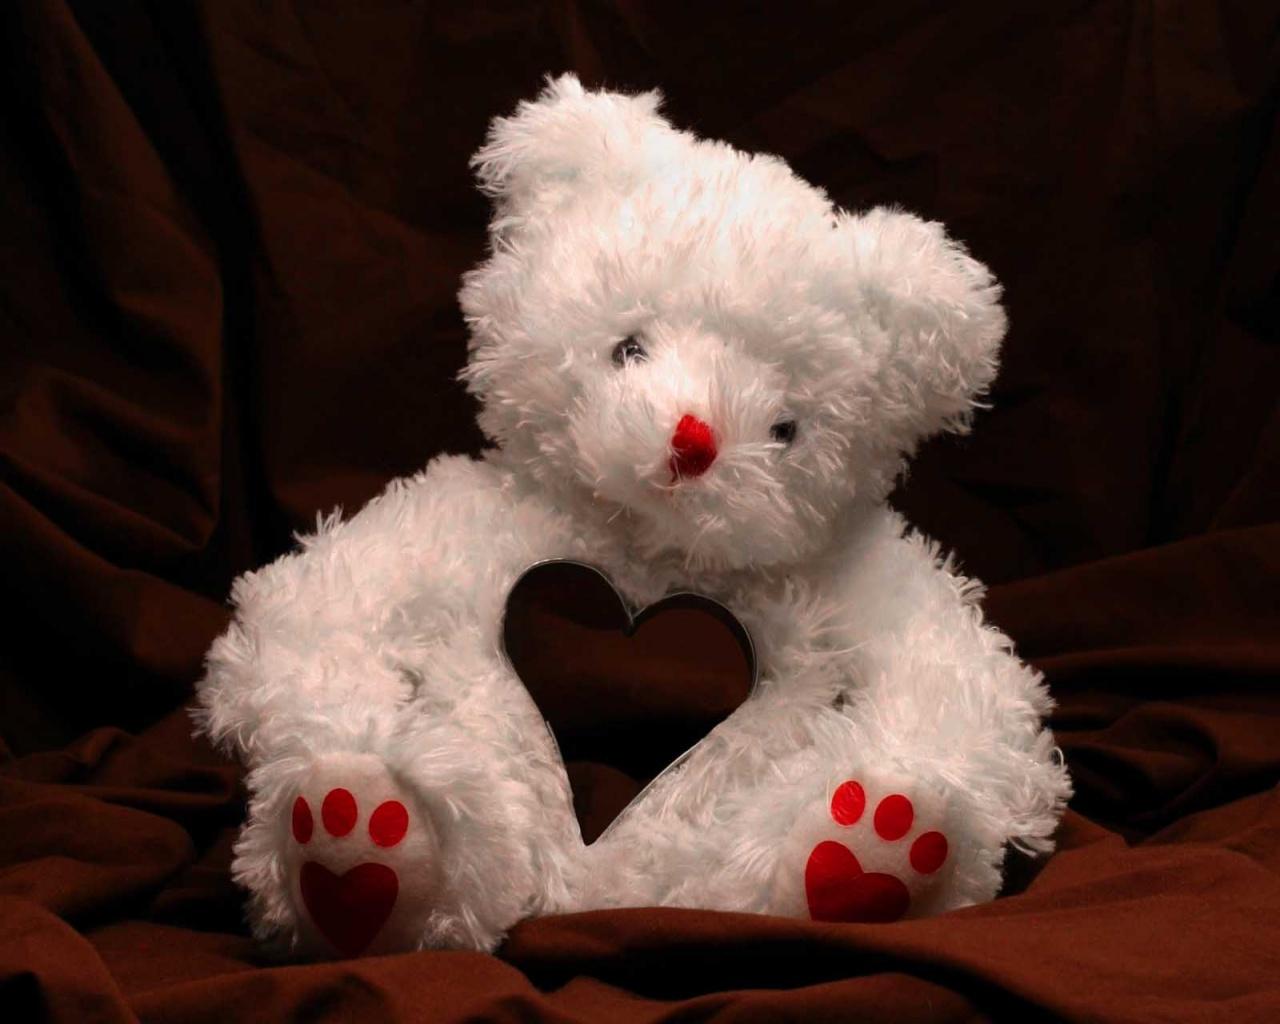 http://2.bp.blogspot.com/_nMUWjsRbDKo/Sw-46UW_woI/AAAAAAAAAMs/P5aRlzgK4LA/s1600/oso_peluche_san_valentin.jpg